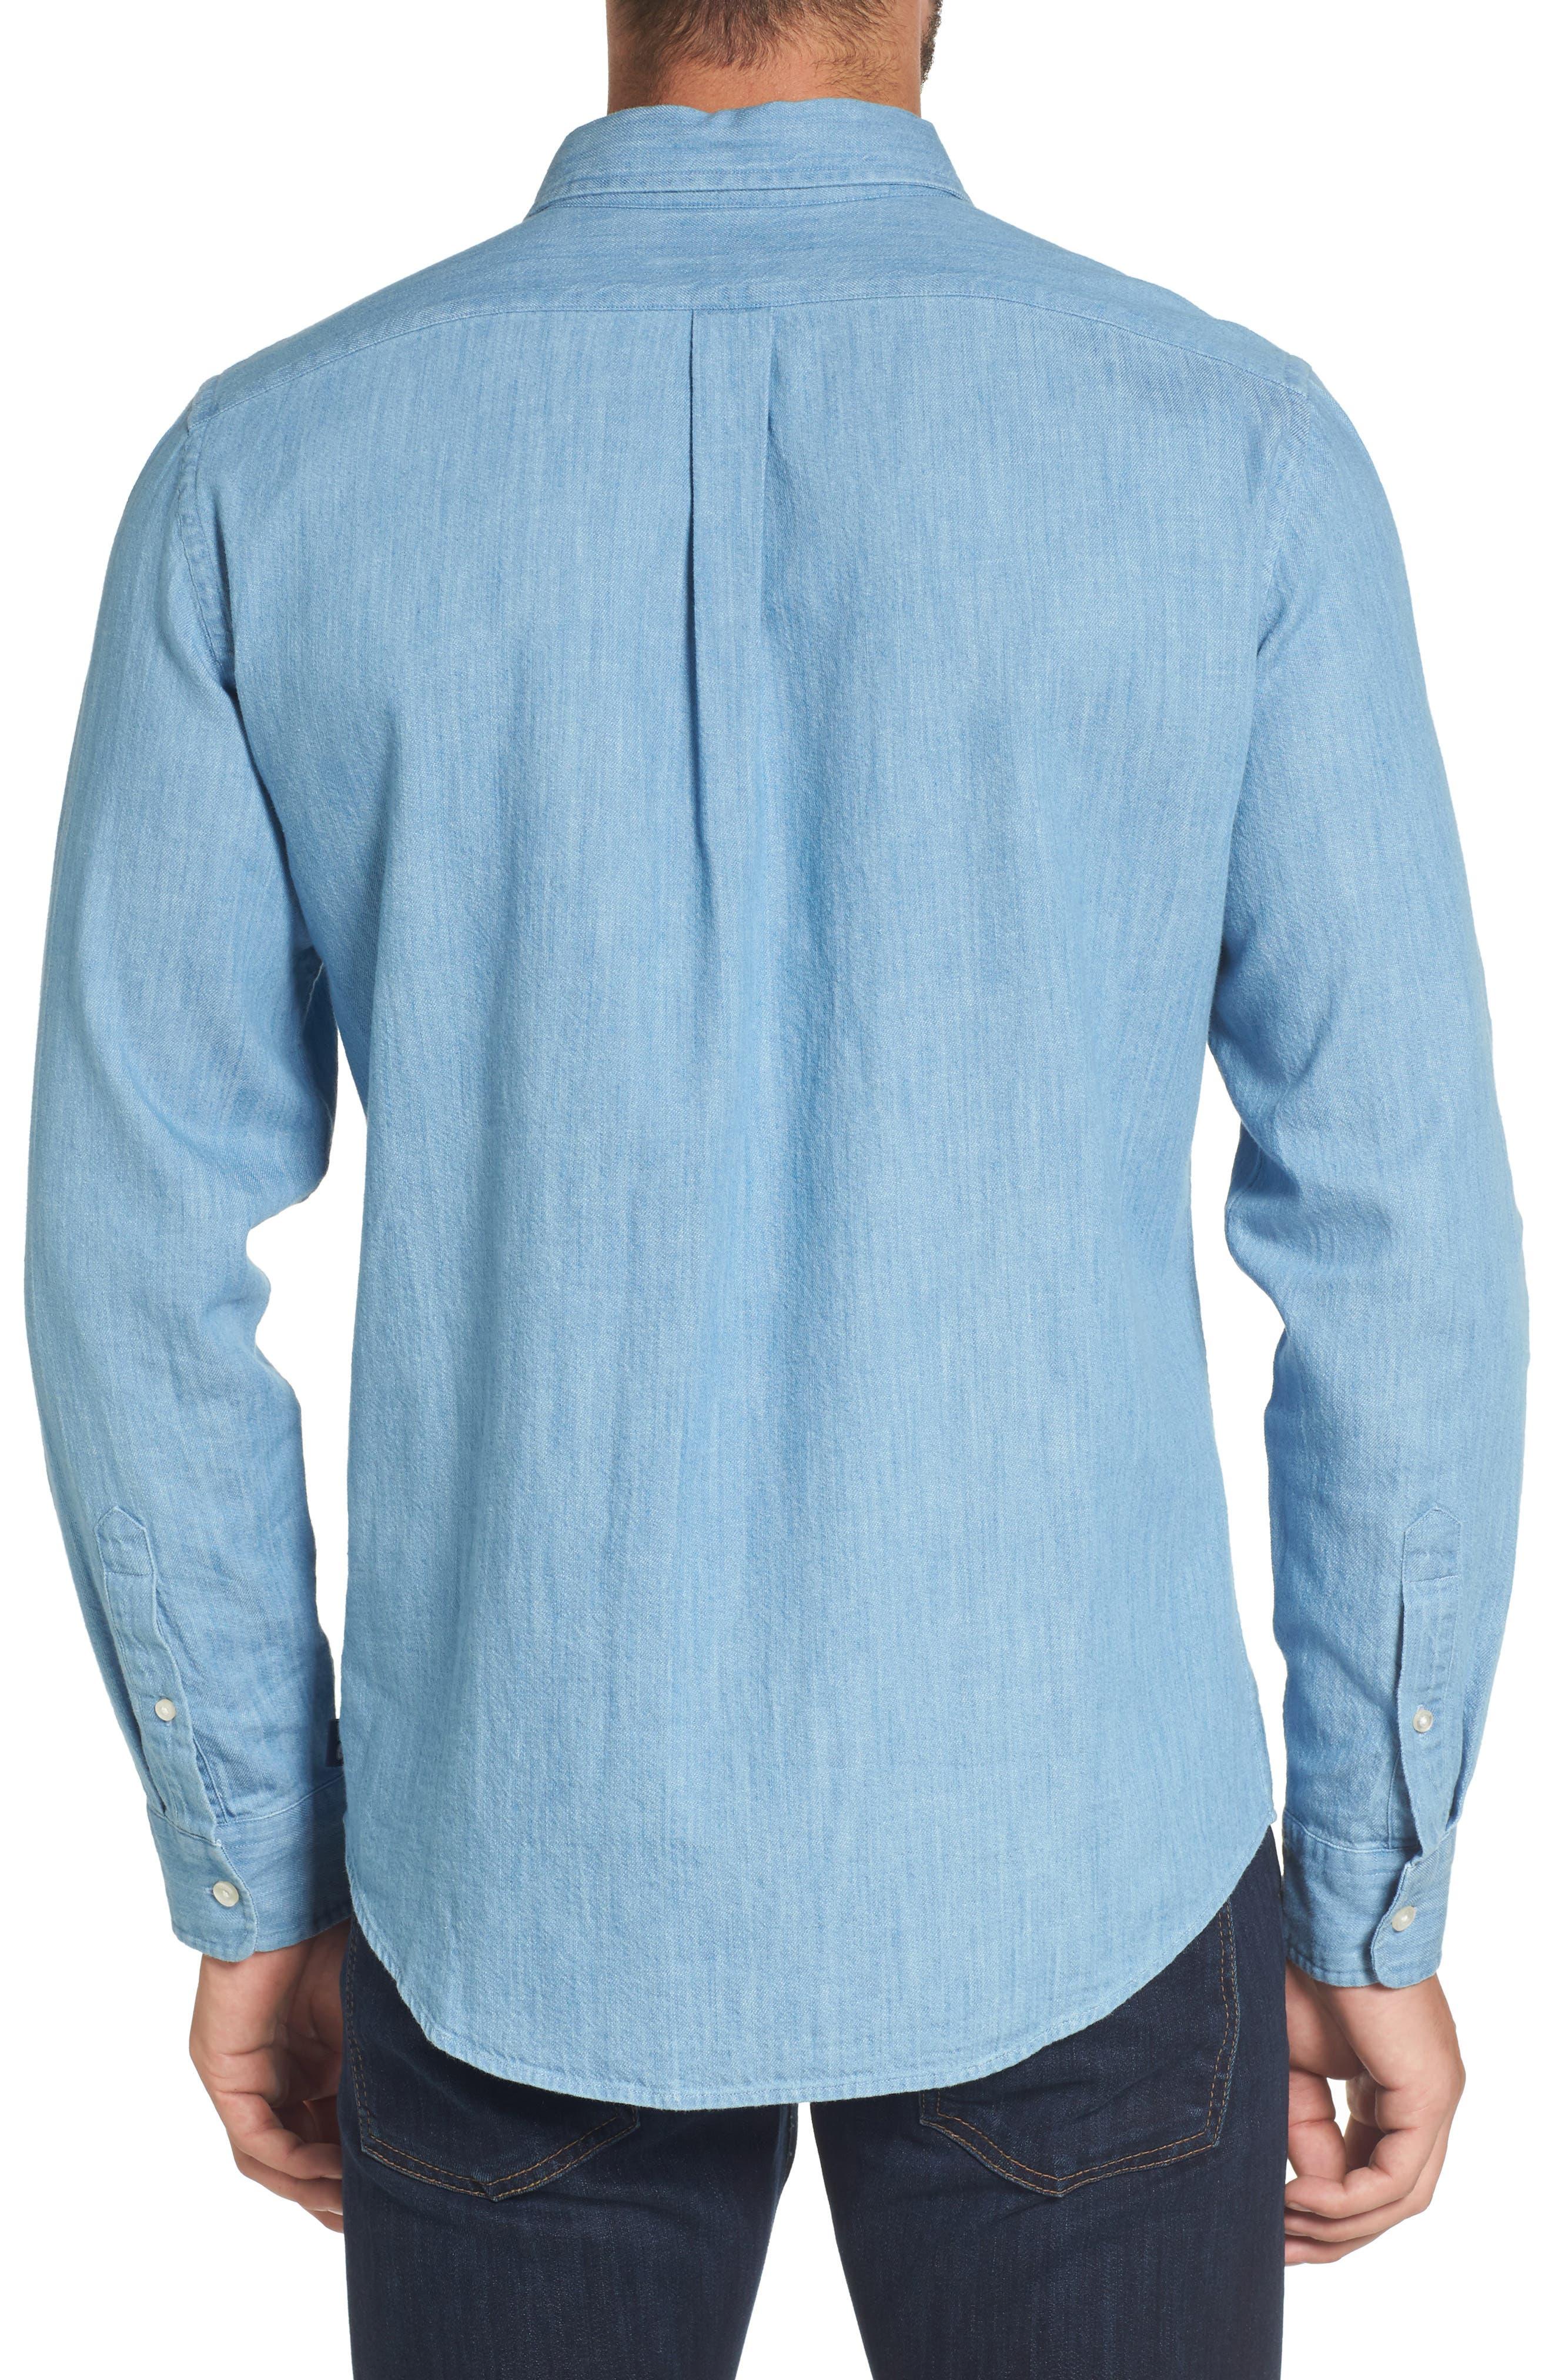 Alternate Image 2  - vineyard vines Lightkeeper Slim Fit Chambray Sport Shirt